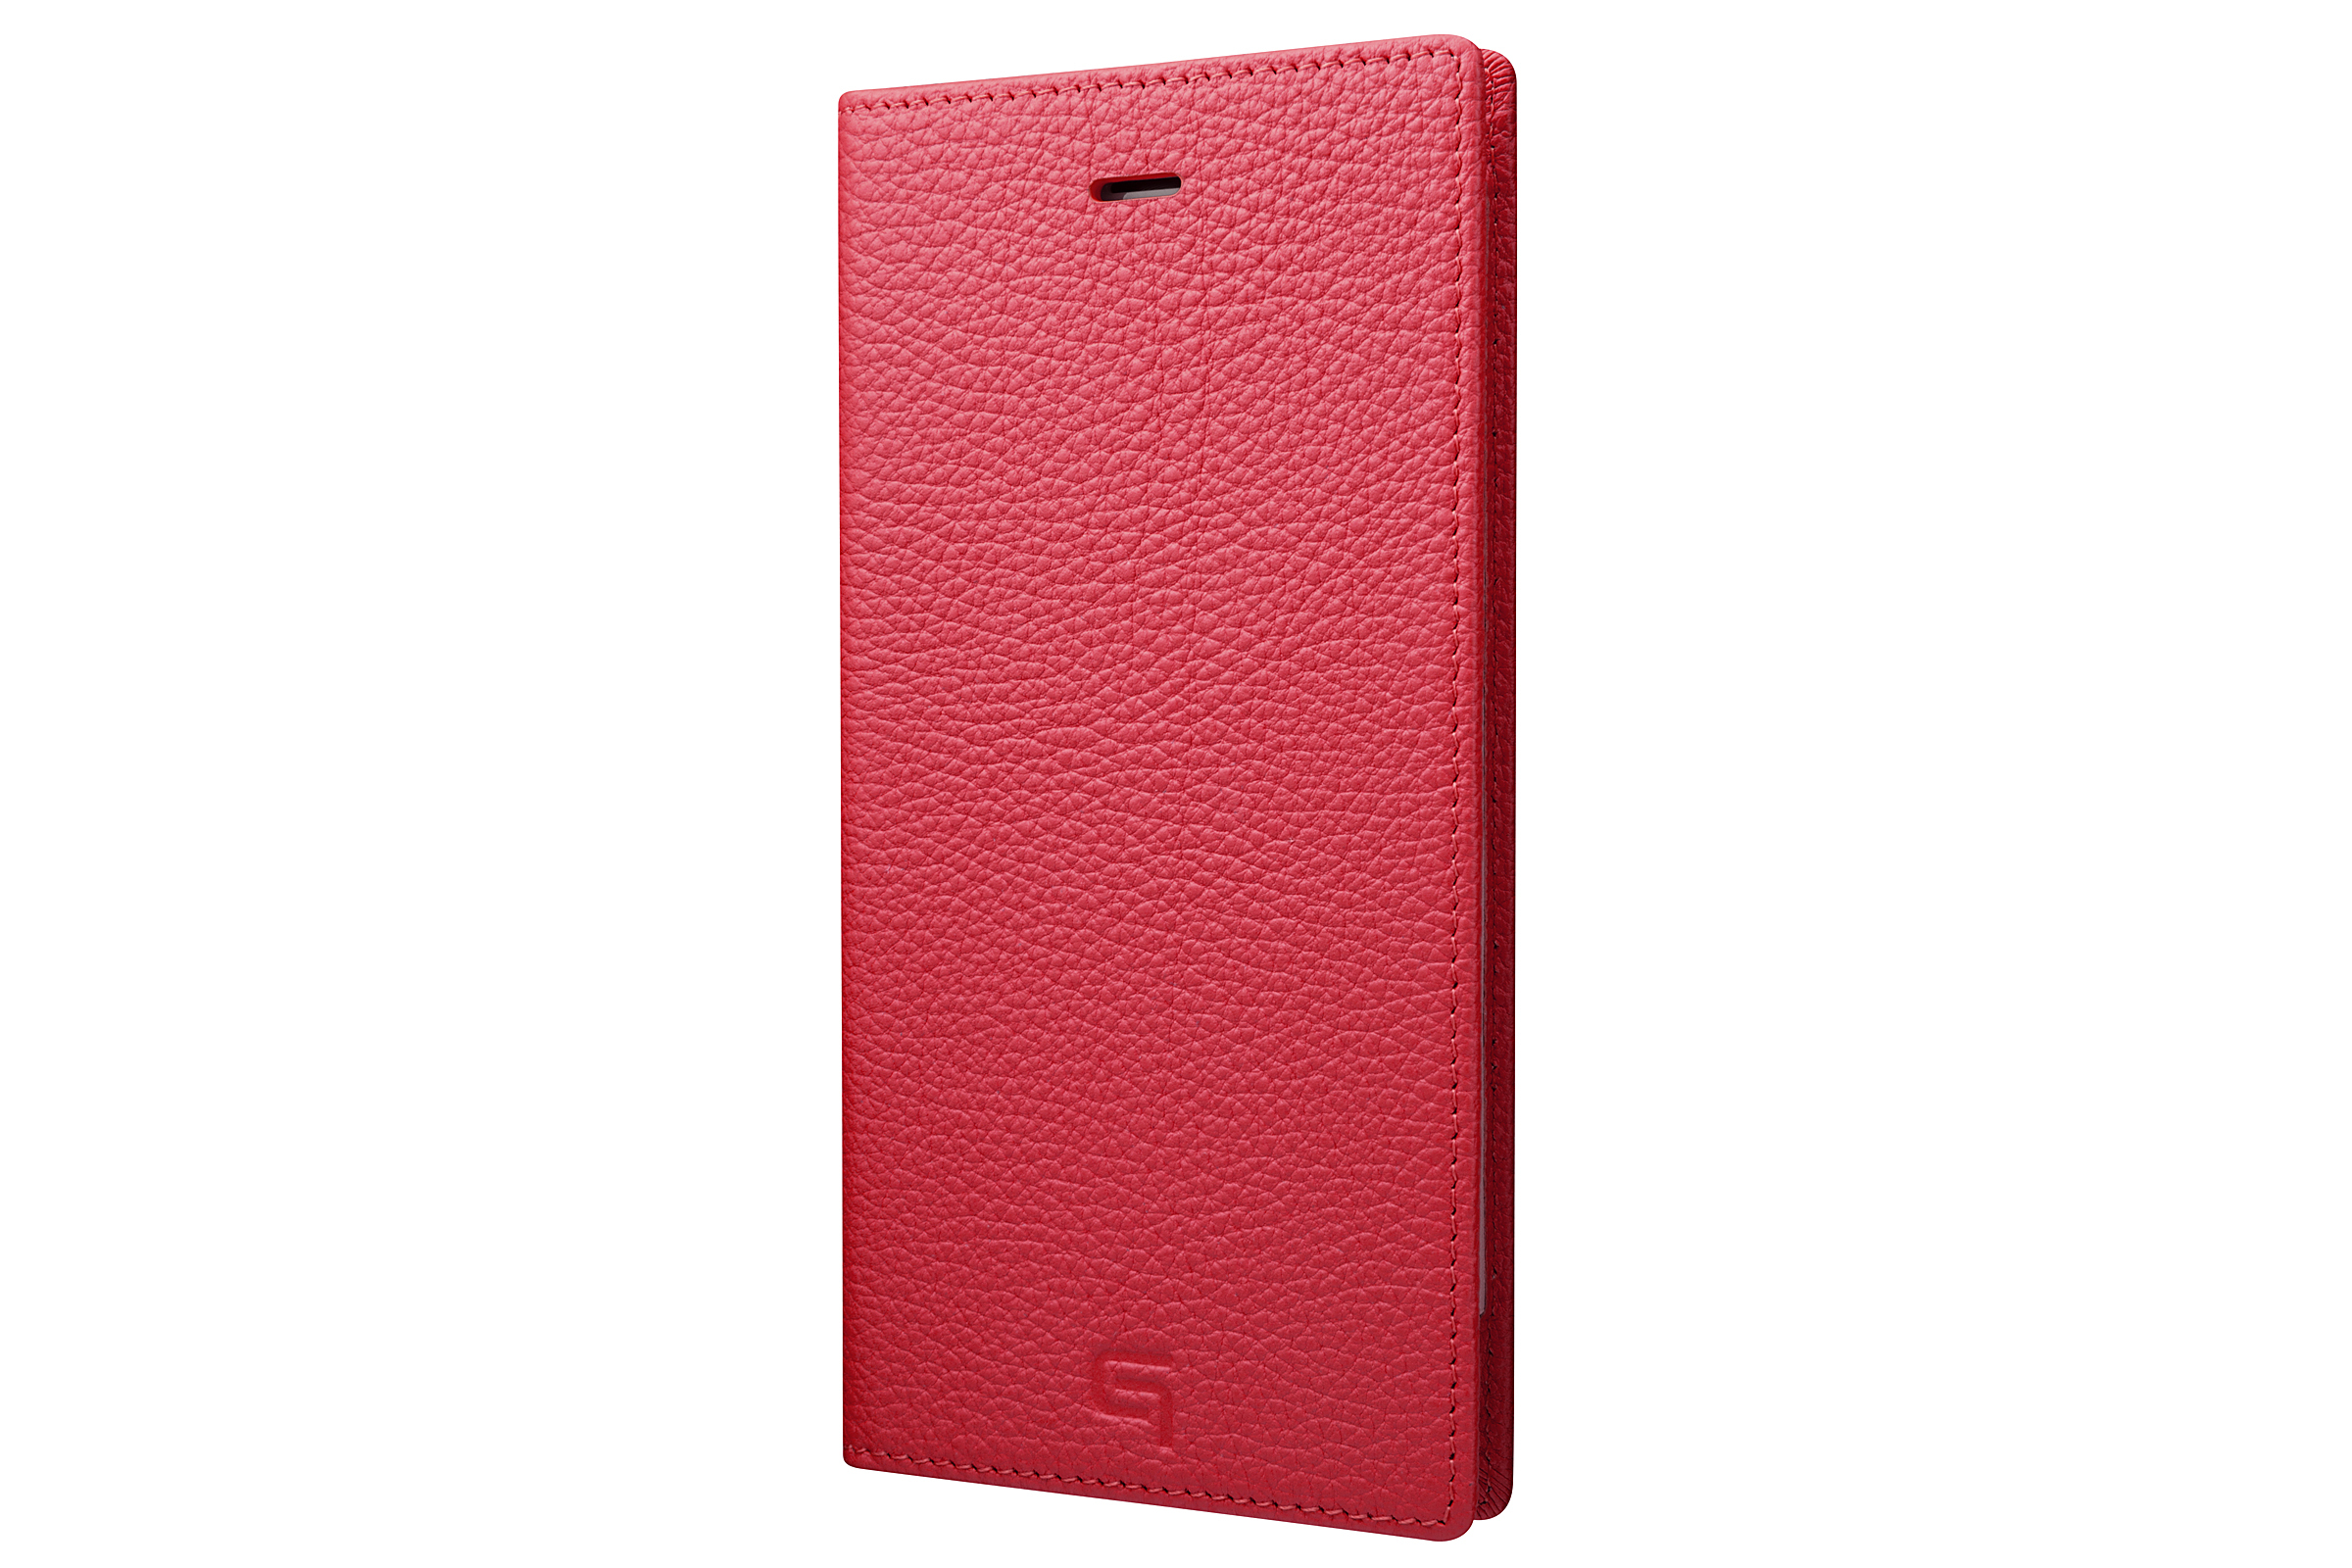 GRAMAS Shrunken-calf Full Leather Case for iPhone 7 Plus(Pink) シュランケンカーフ 手帳型フルレザーケース - 画像1